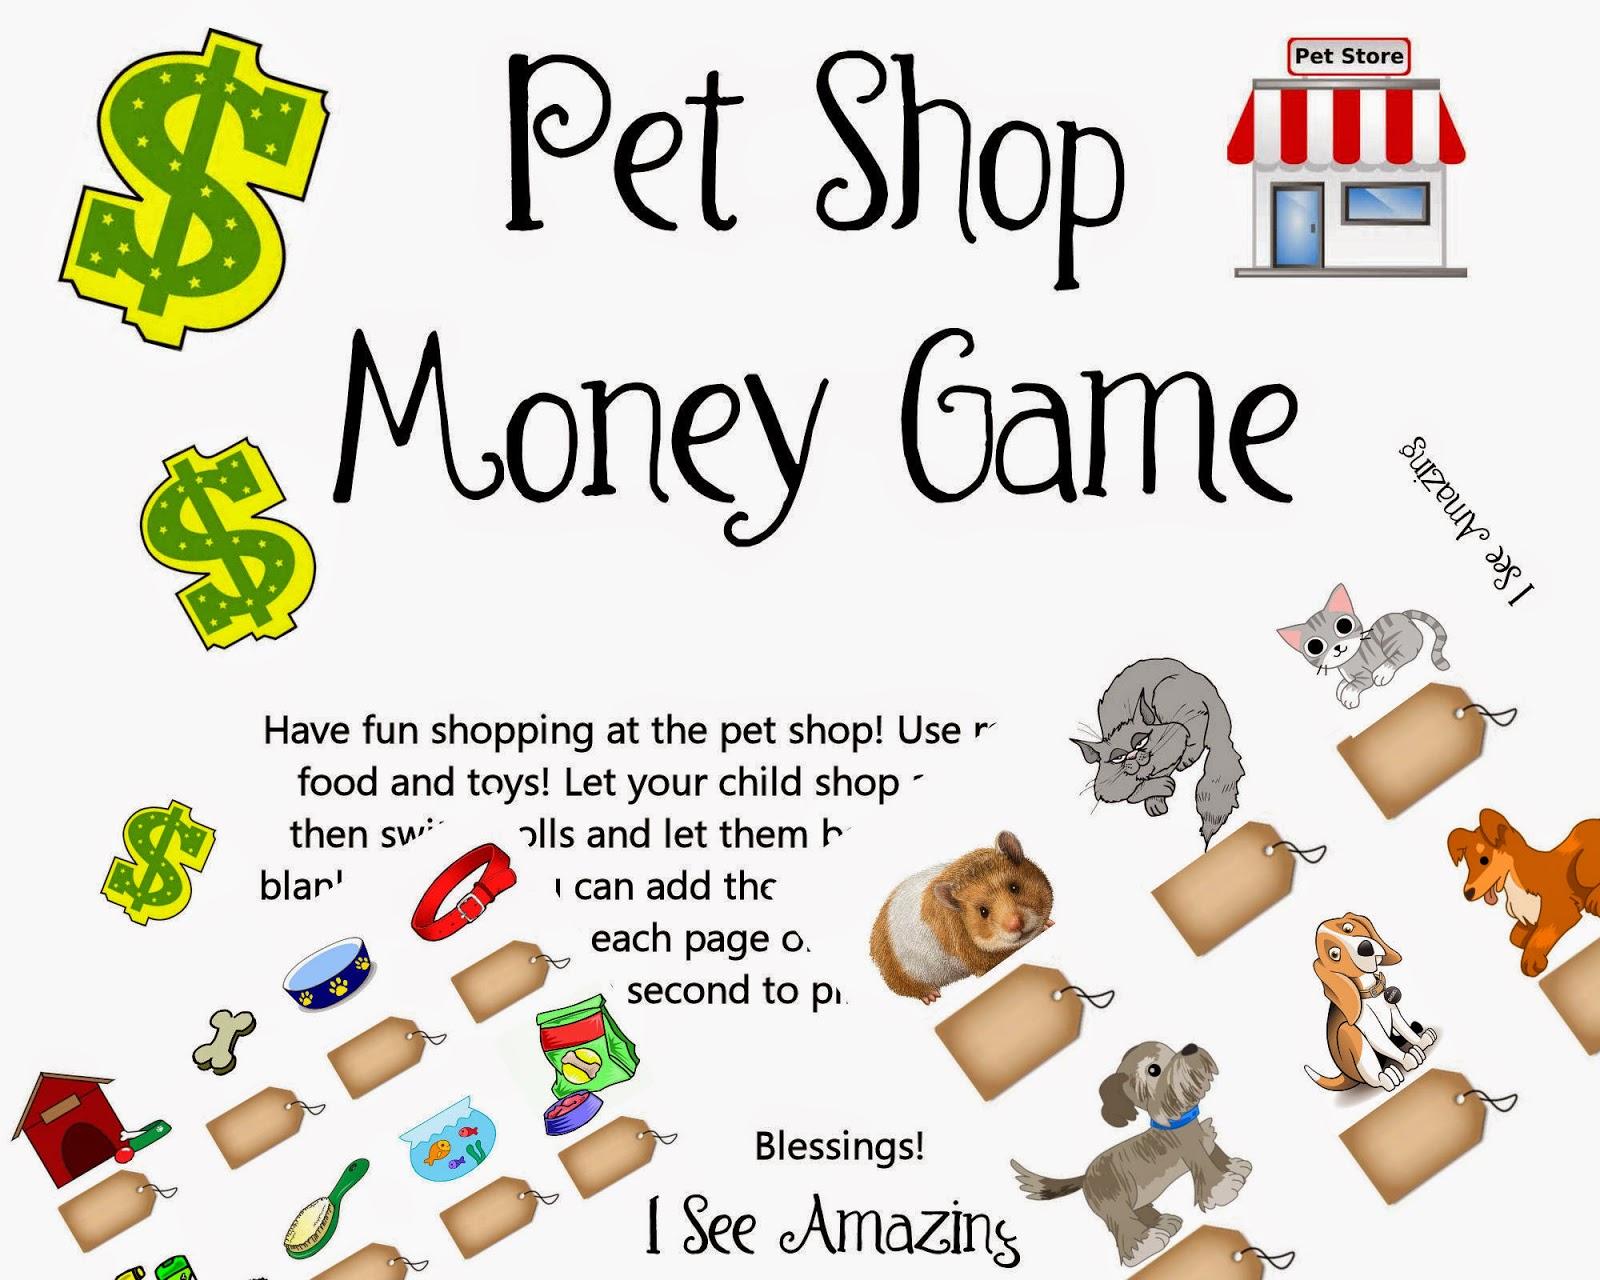 I See Amazing Printable Pet Shop Money Game